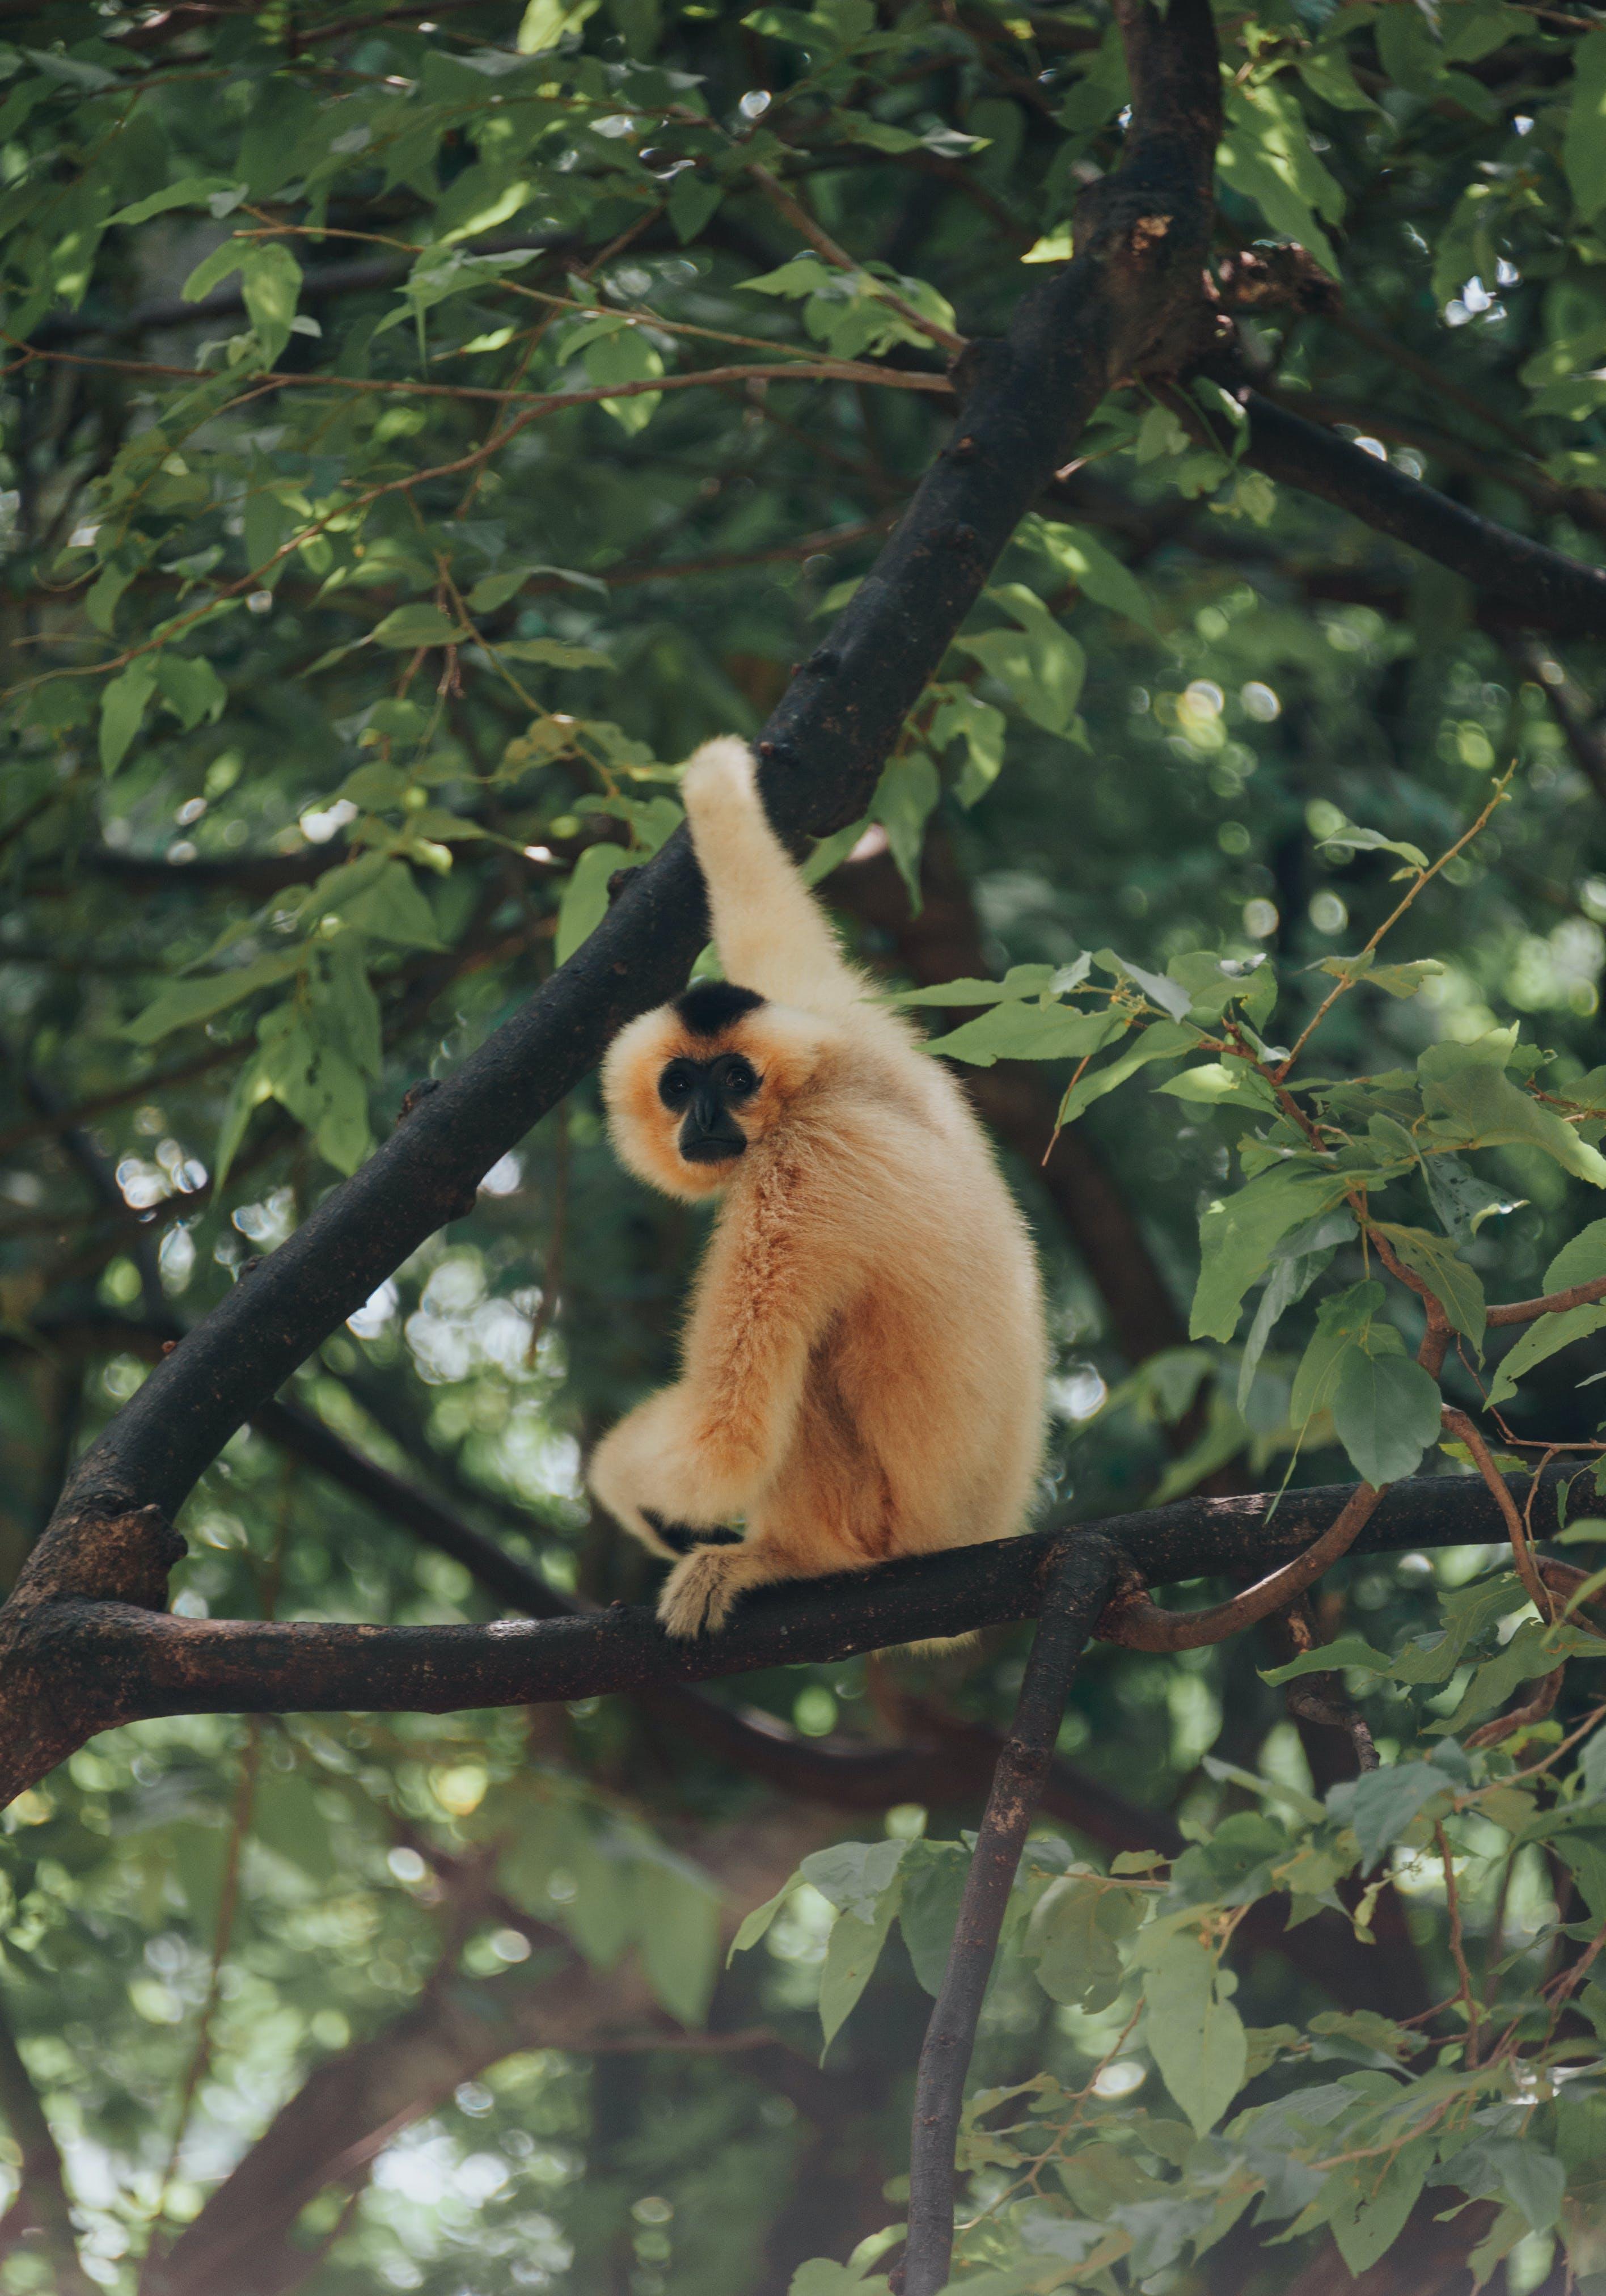 Brown Primate Sitting on Tree Branch